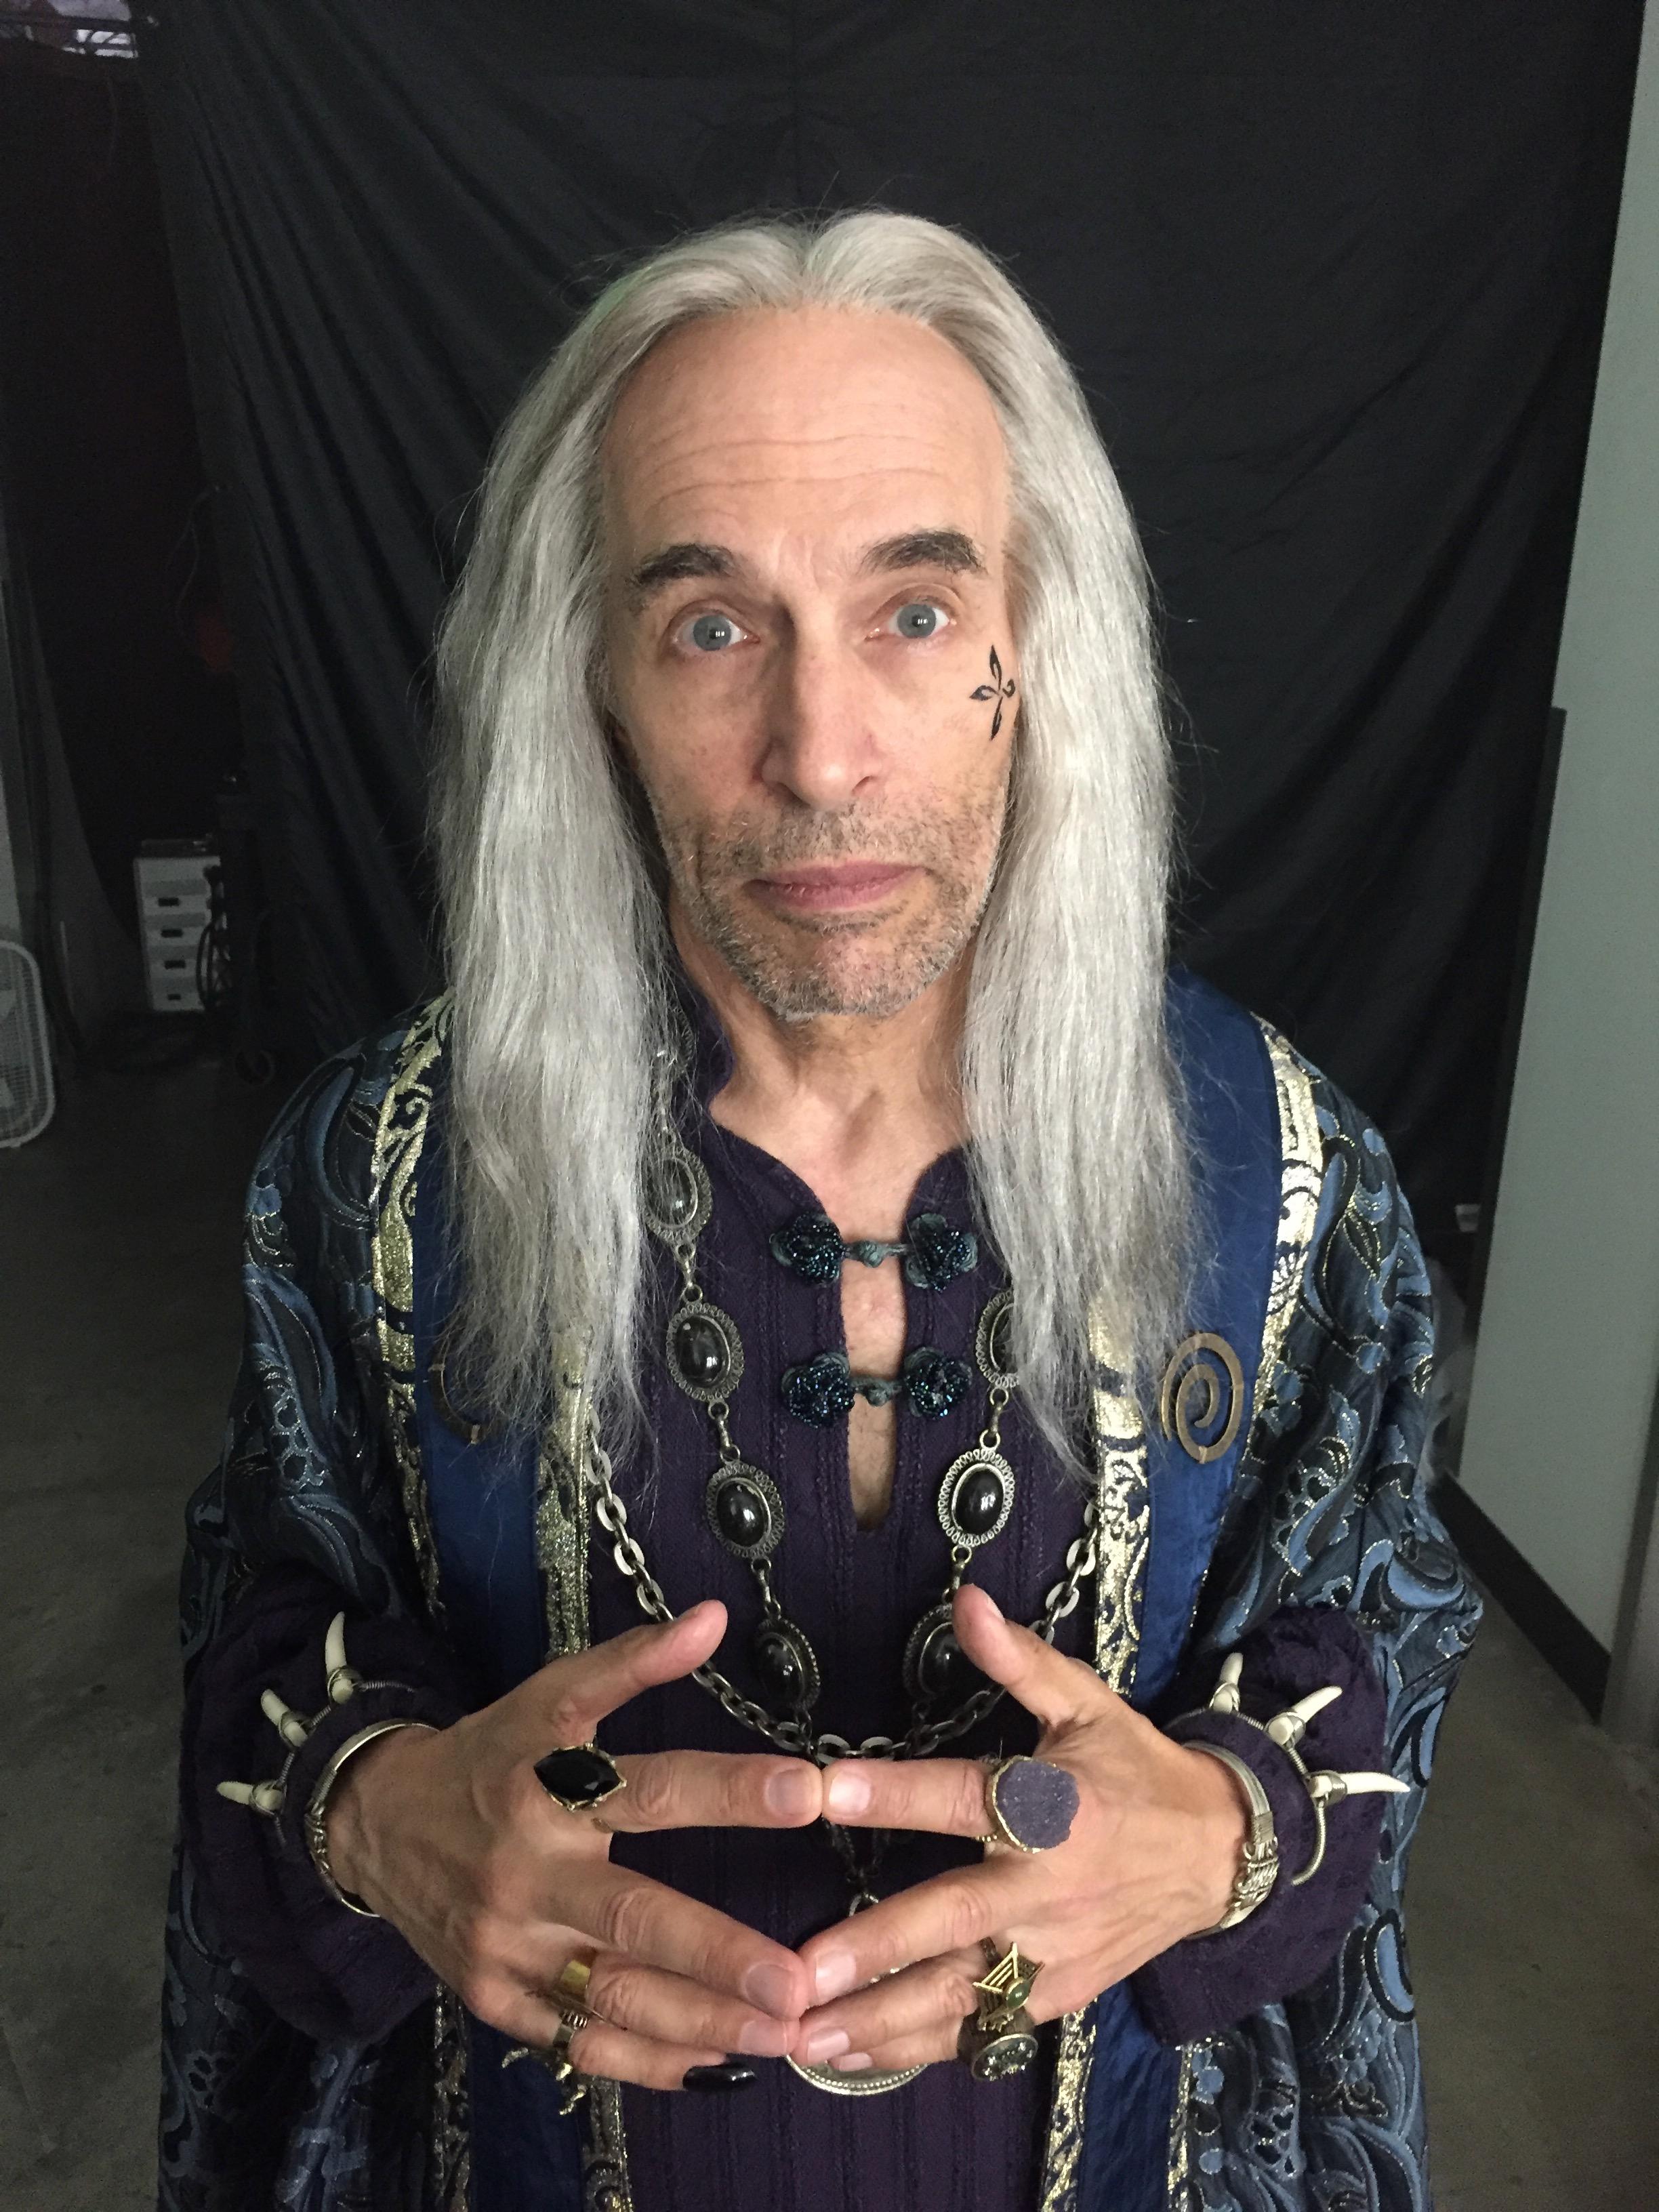 Amazon - Wizard Wig